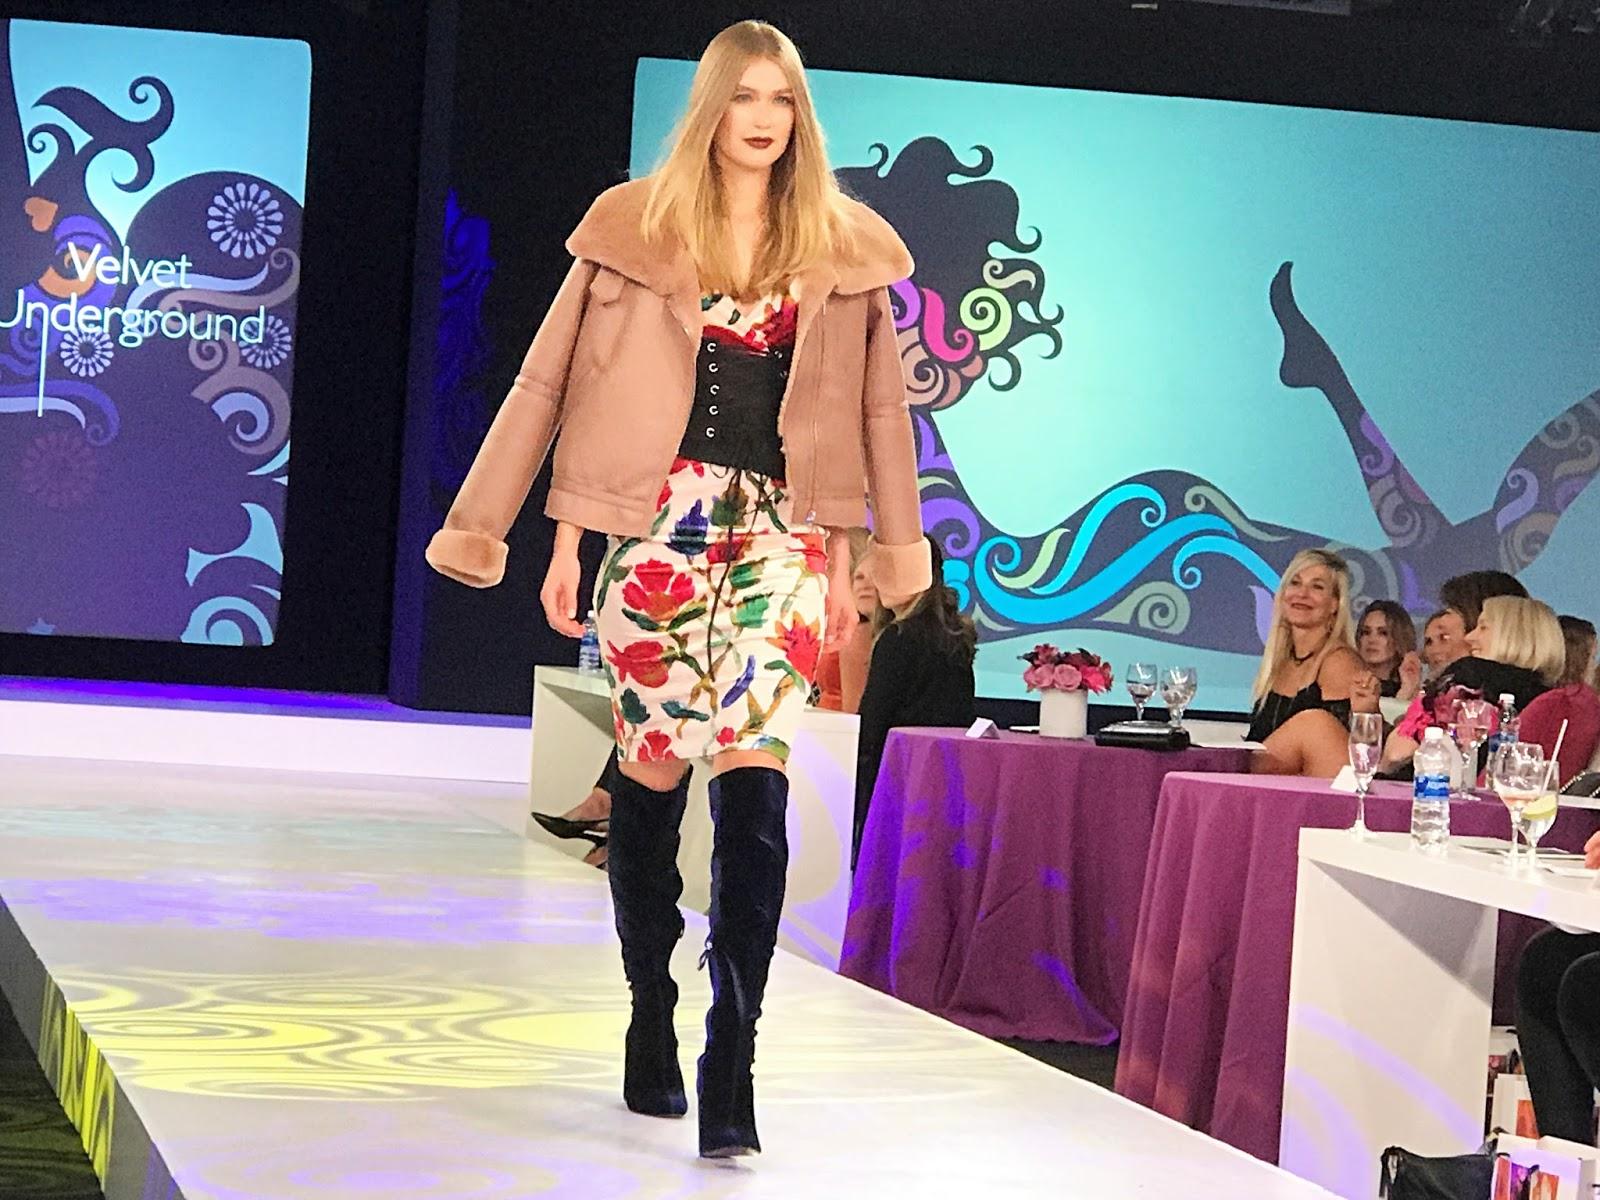 Bellevue fashion week 2018 19